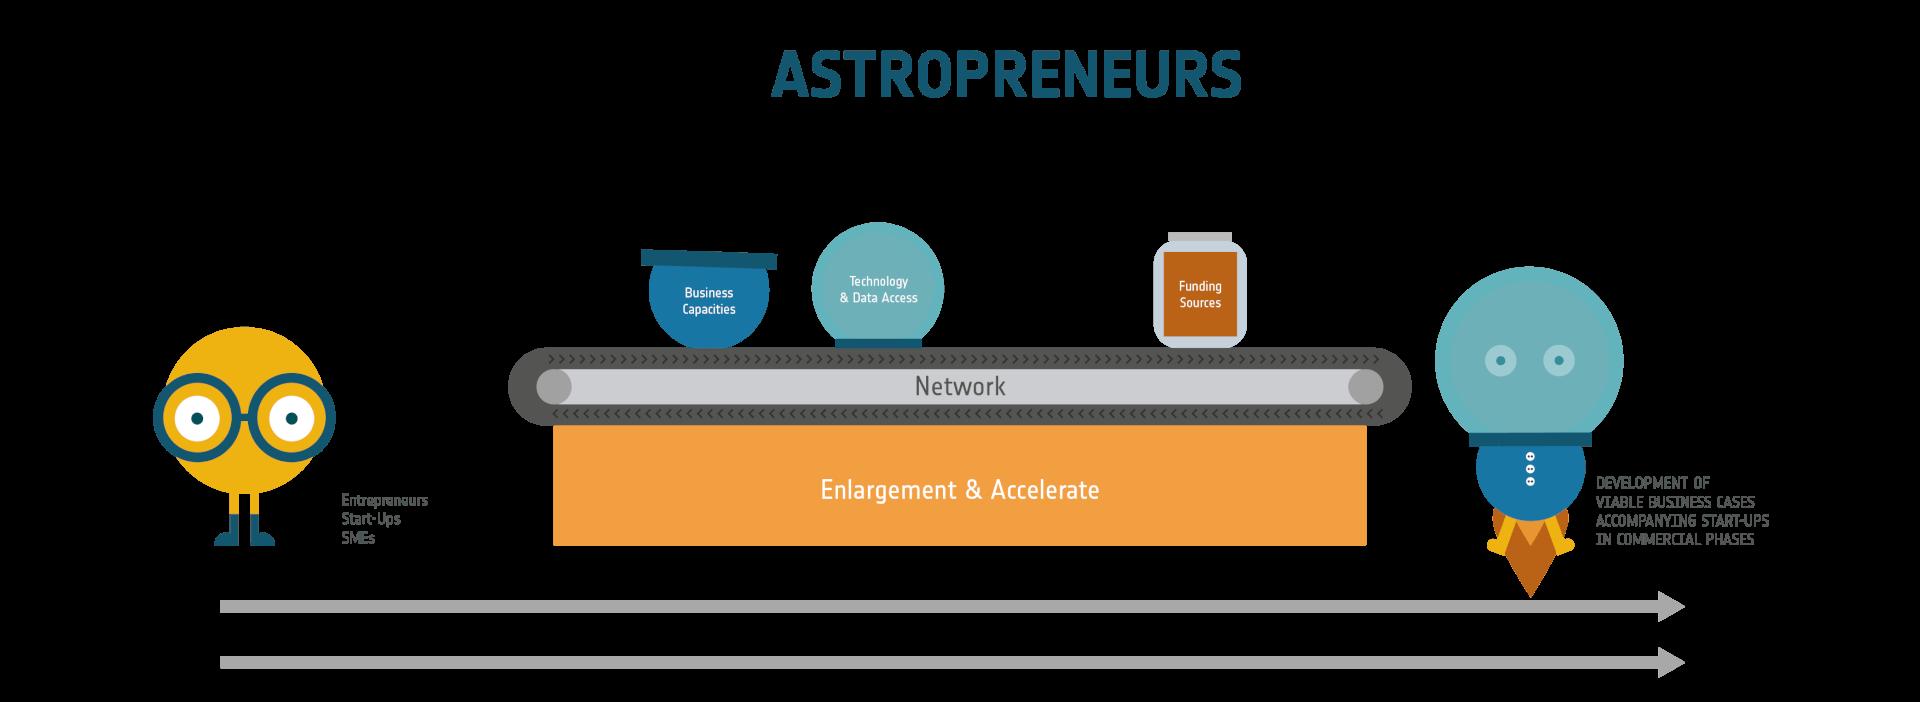 ESA_Astropreneurs-01_concept